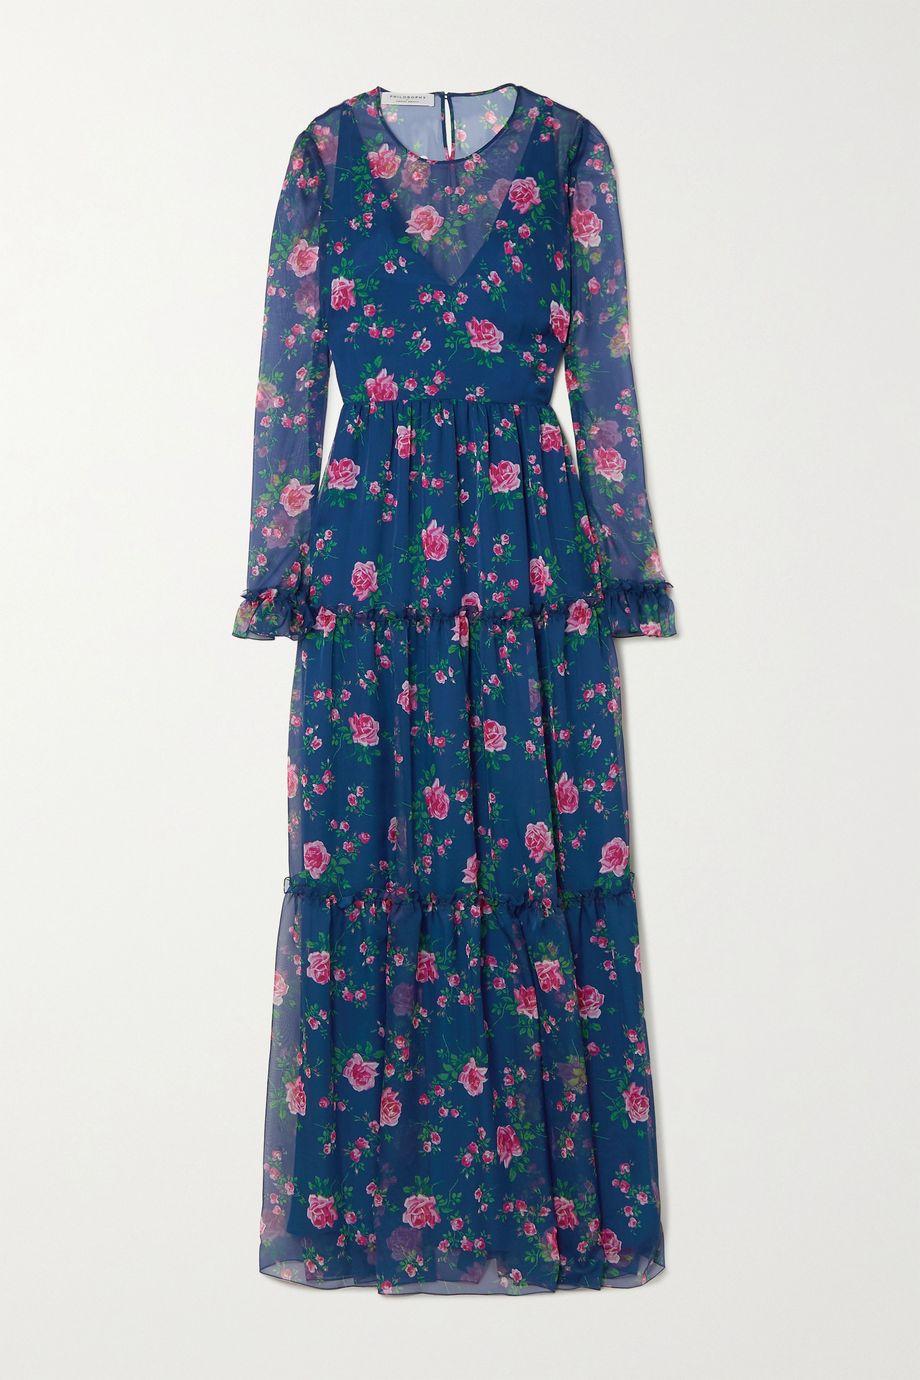 Philosophy di Lorenzo Serafini Tiered floral-print chiffon maxi dress